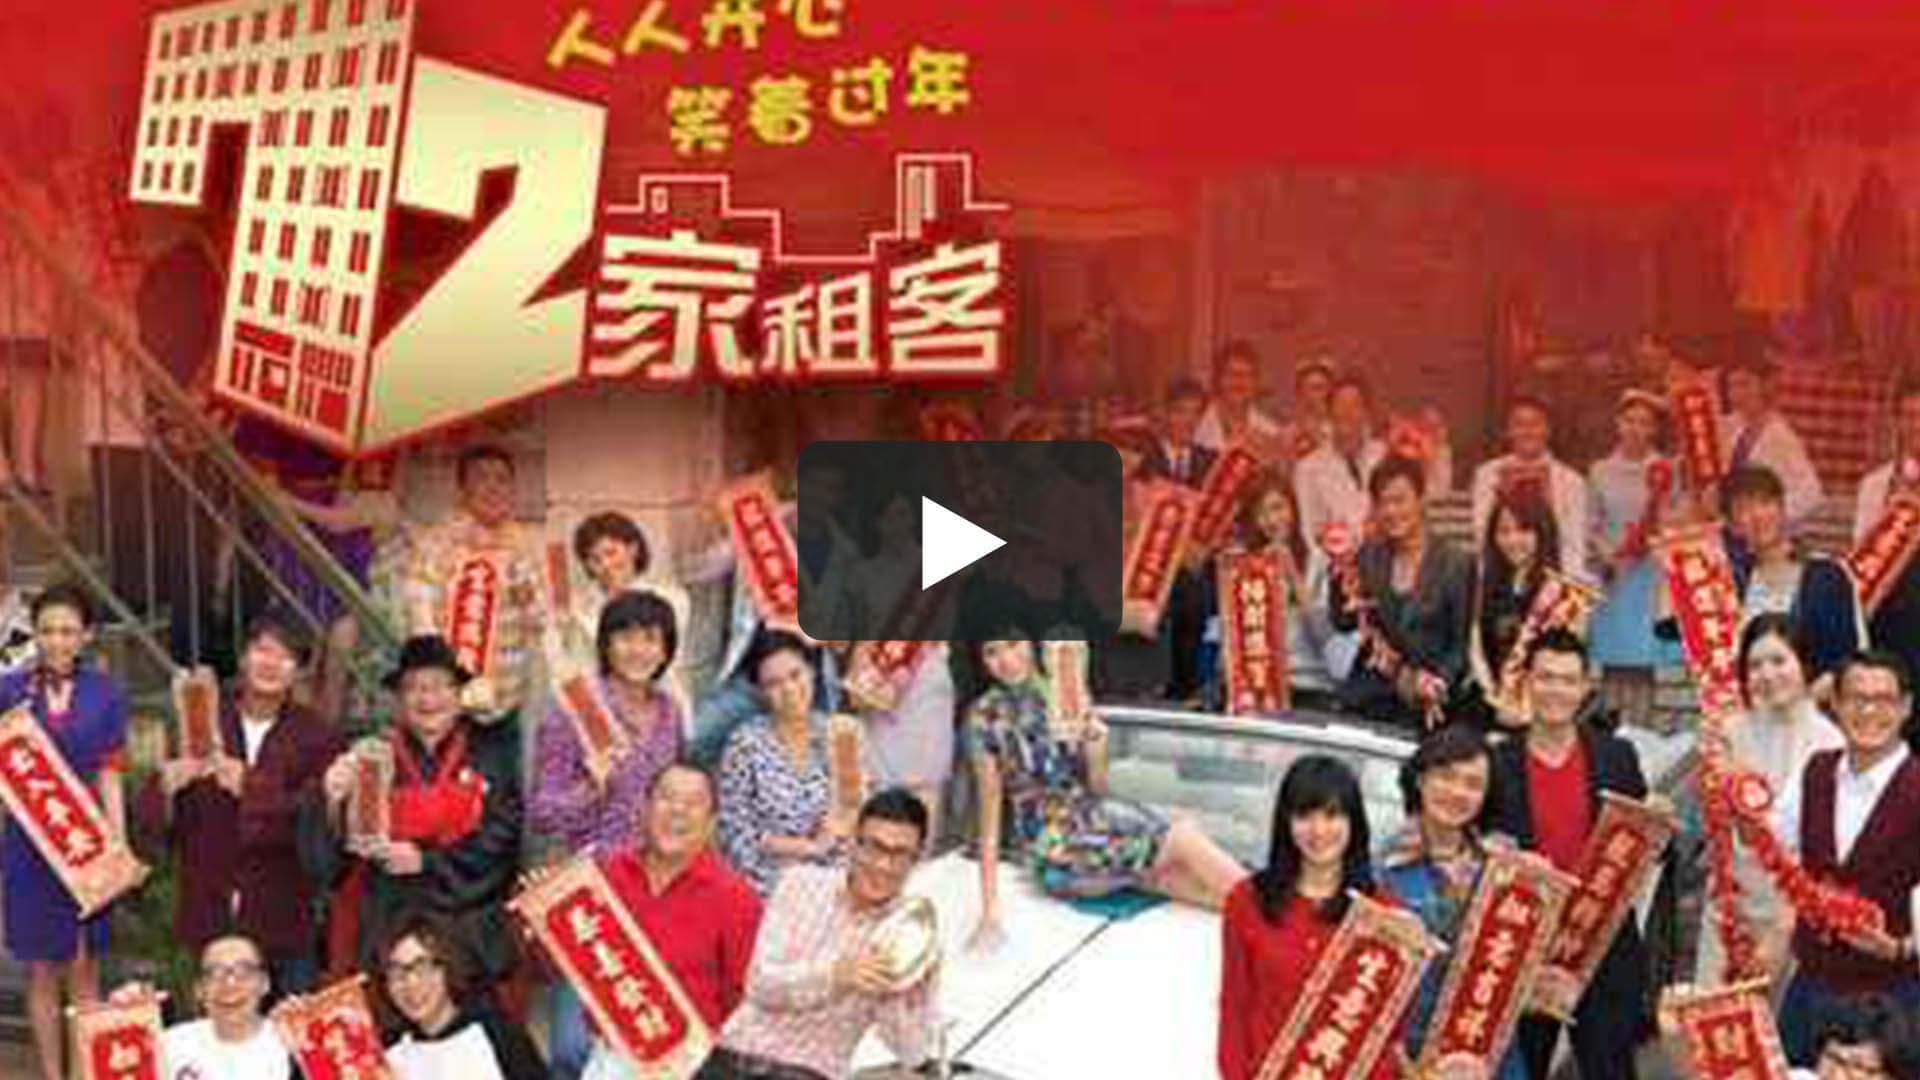 72家租客 - 72 Tenants of Prosperity